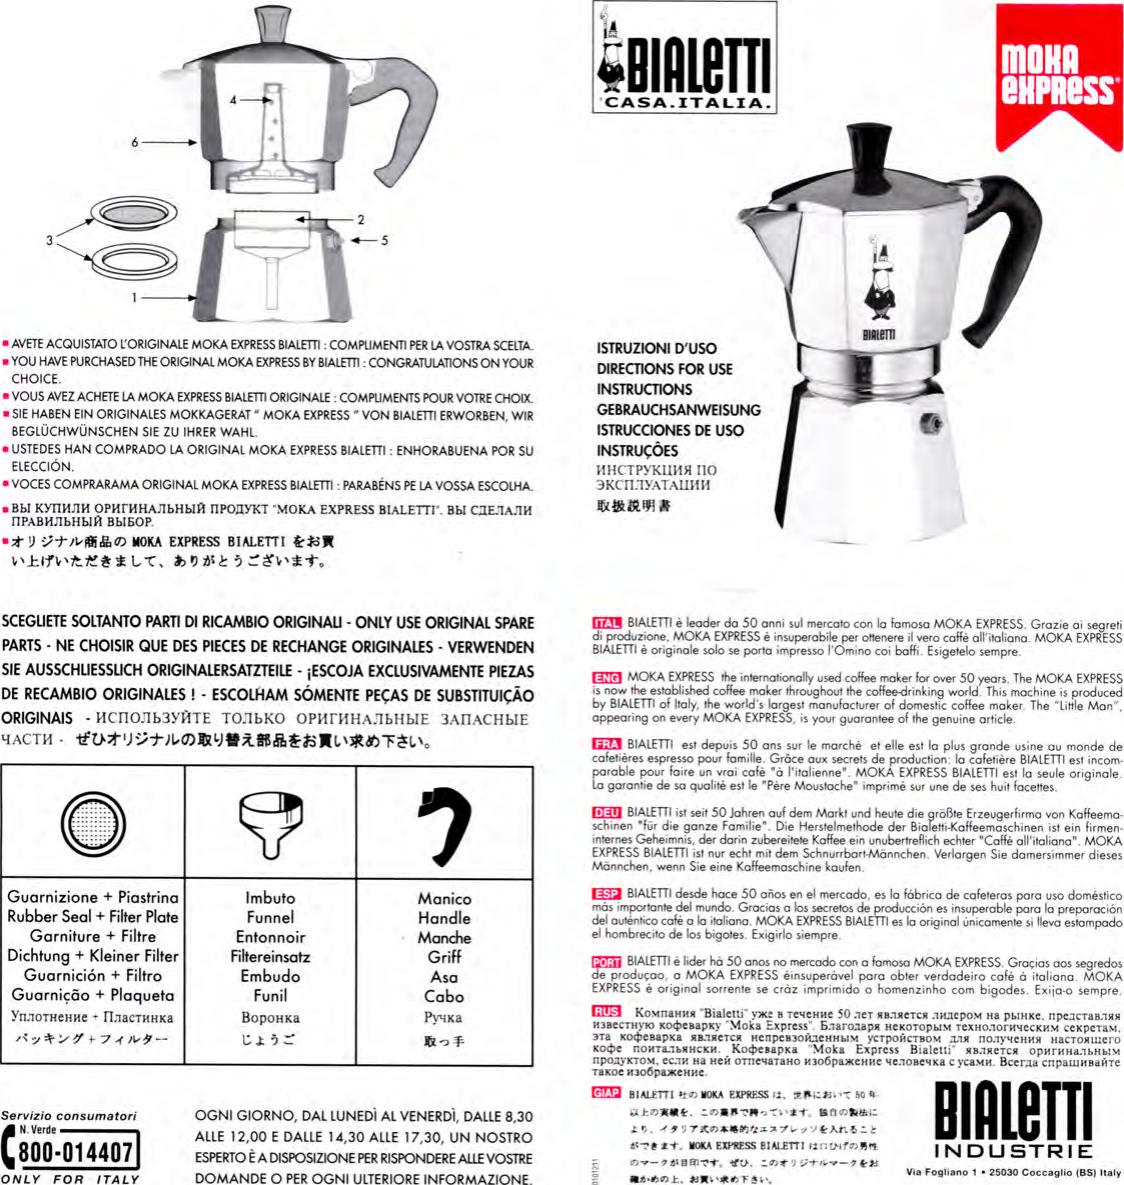 Page 1 of 2 - Bialetti Bialetti-Coffee-Maker-Mokaexpress-Users-Manual- Moka Express  Bialetti-coffee-maker-mokaexpress-users-manual